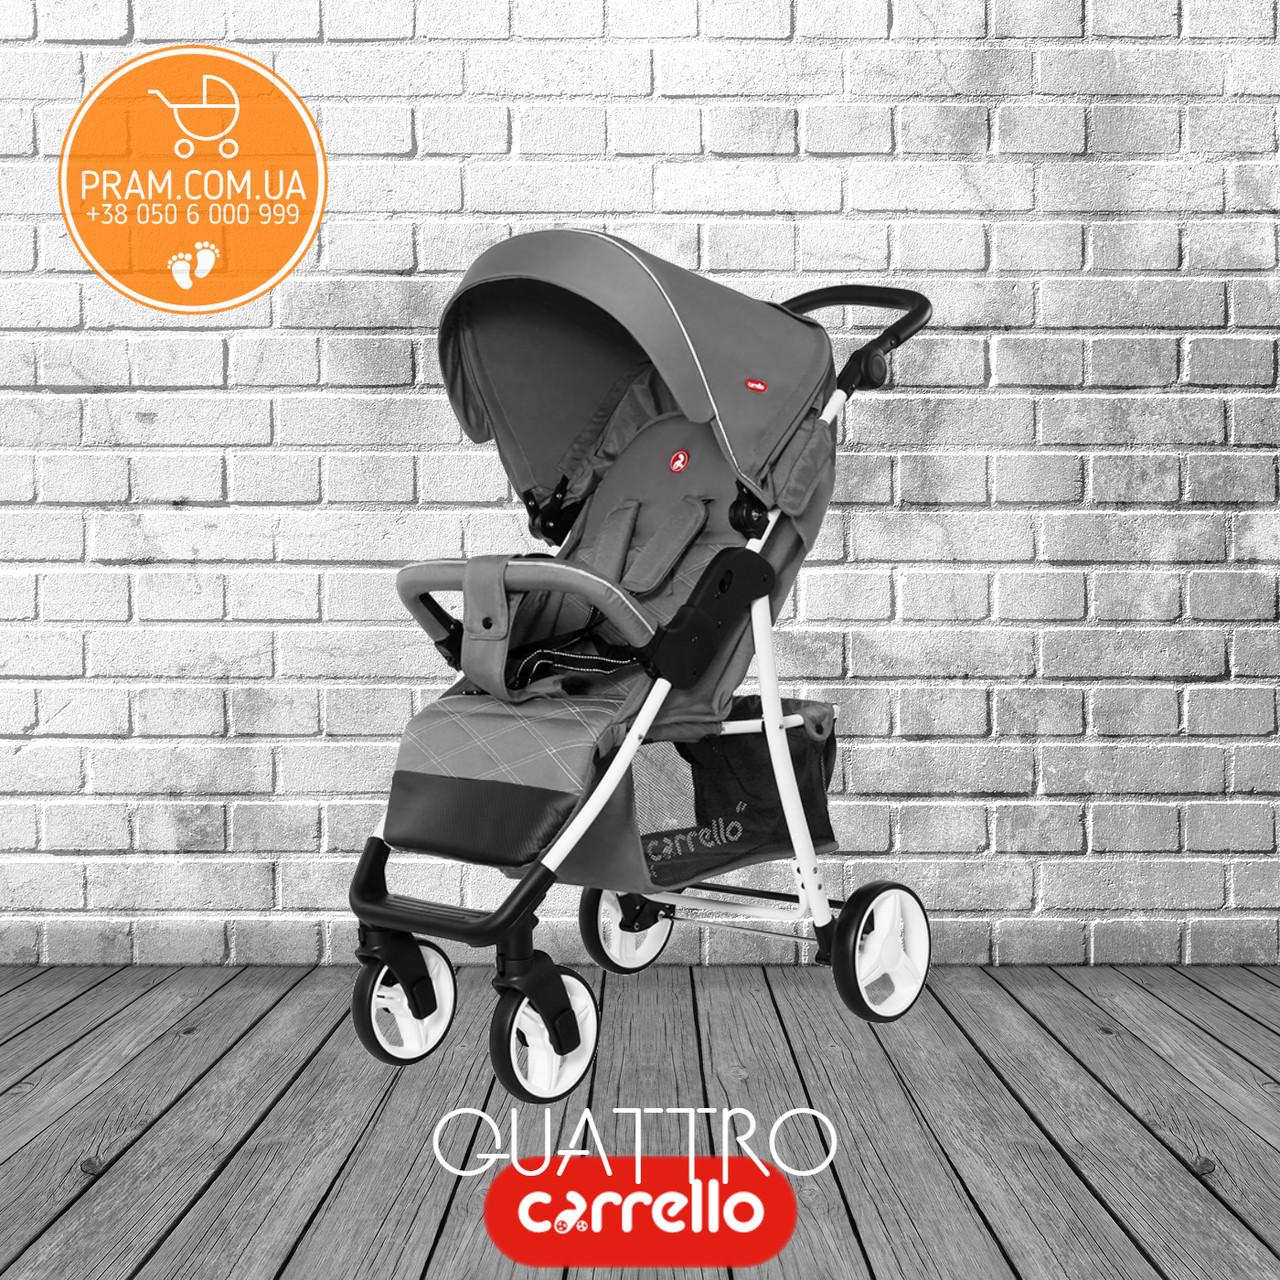 Carrello Quattro CRL-8502/2 2019 прогулочная коляска Fog Gray Серый